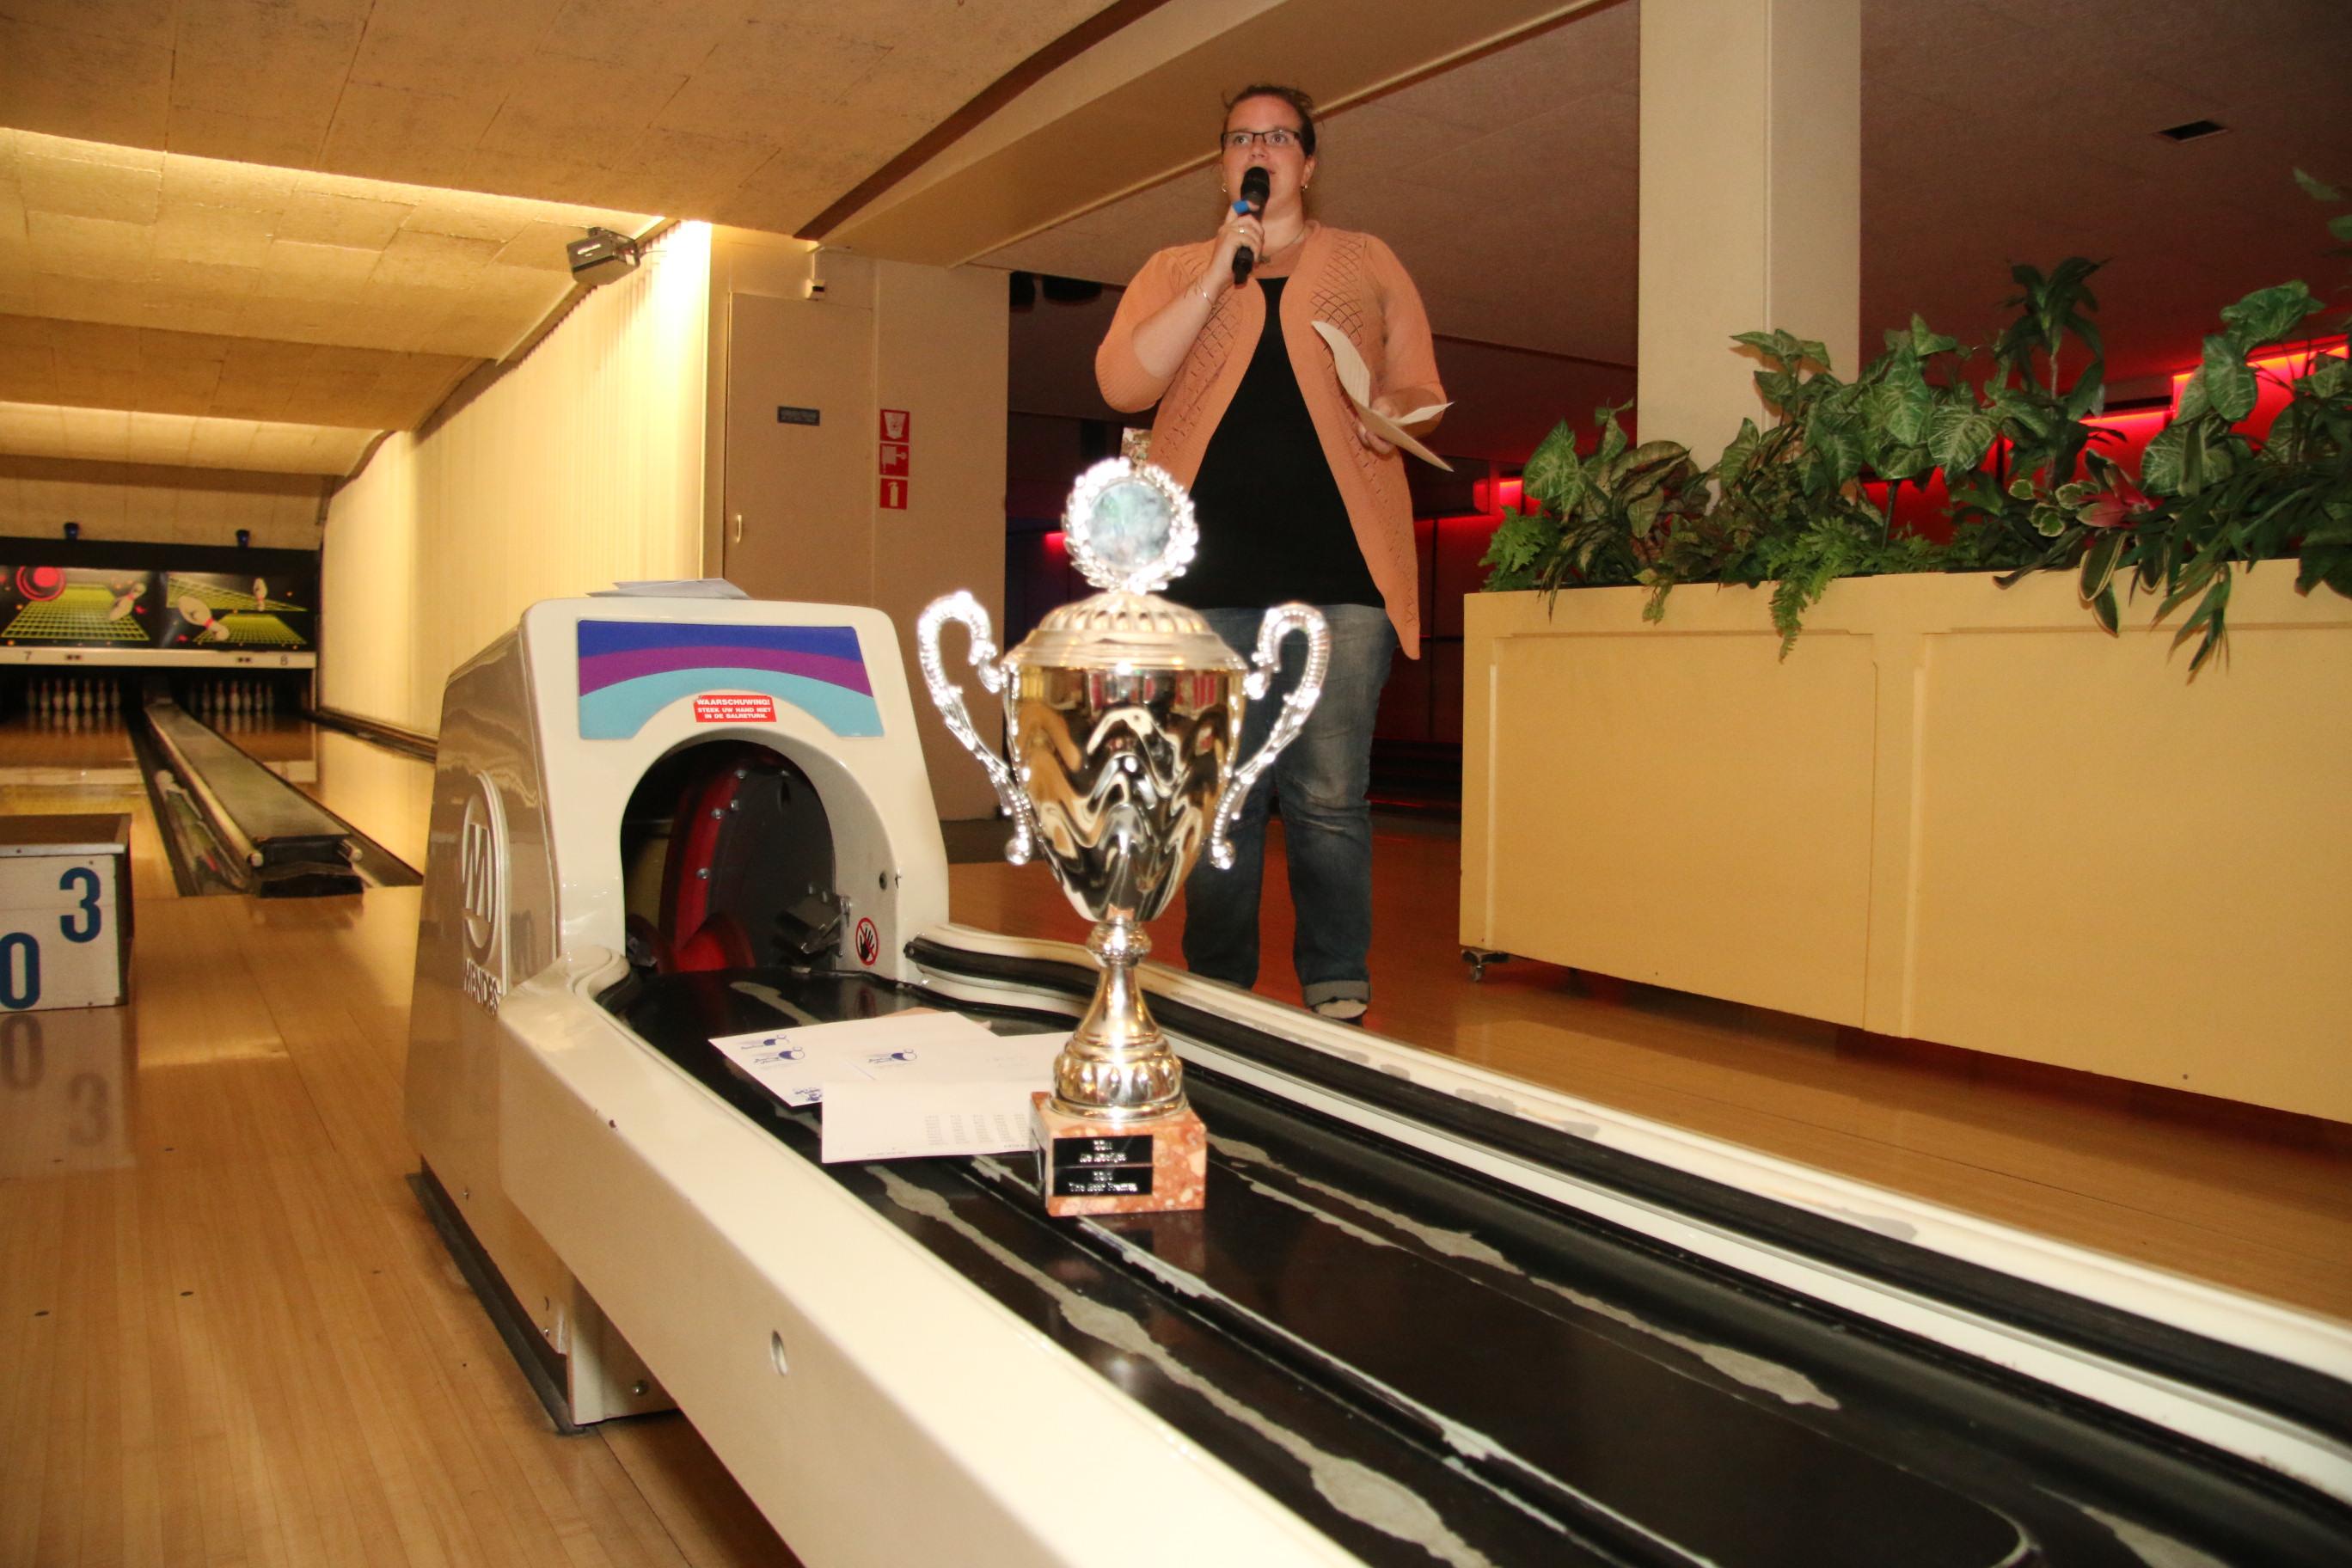 http://www.bowlingverenigingheiloo.nl/fotos_verhalen/foto's/2016_0526-Patricia 3.jpg